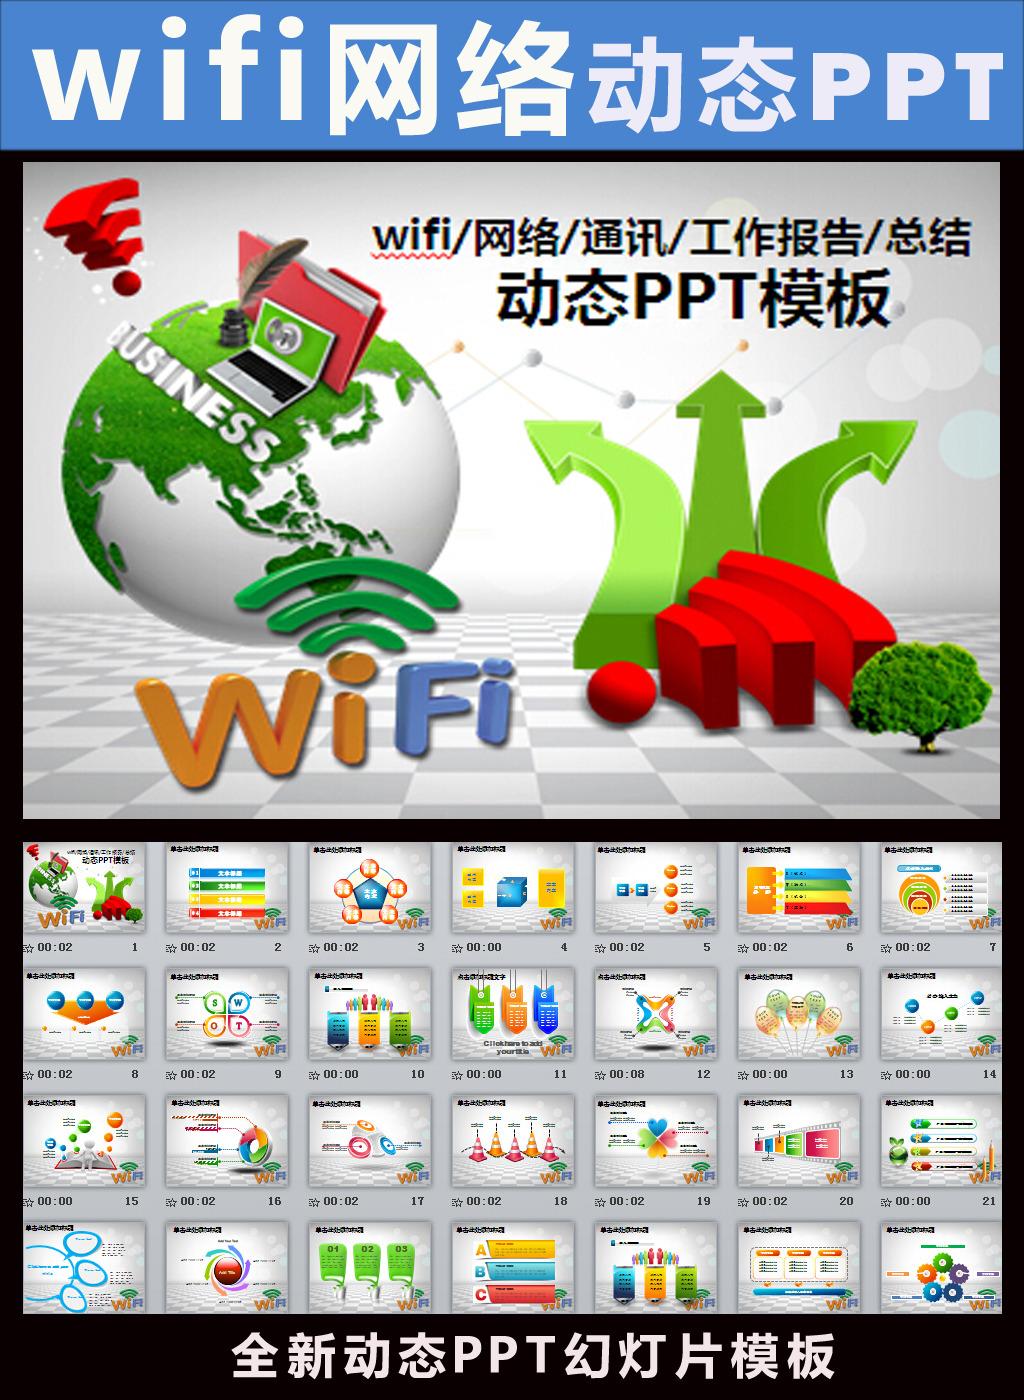 wifippt模板电子商务网络动态ppt模板下载(图片编号